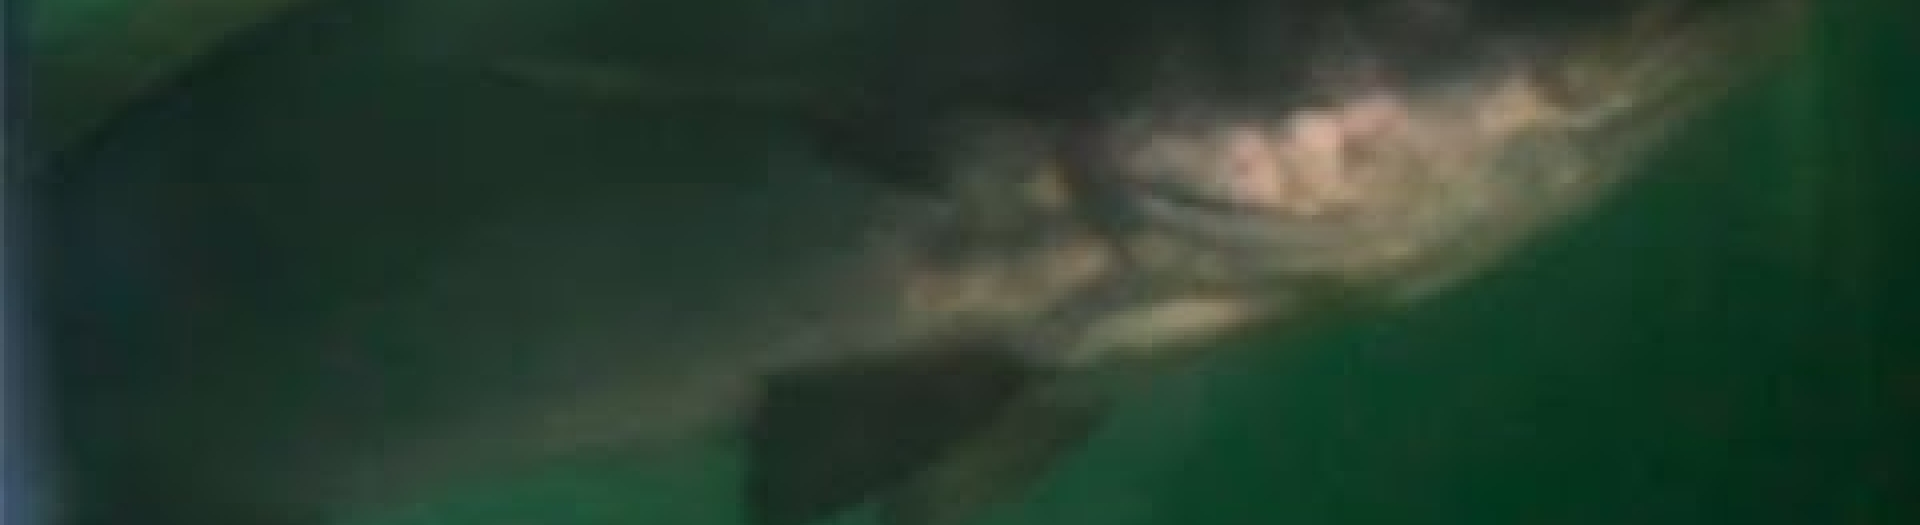 Embedded thumbnail for Totoaba, el oro del mar (UABC NO SE DETIENE) - IMAGO